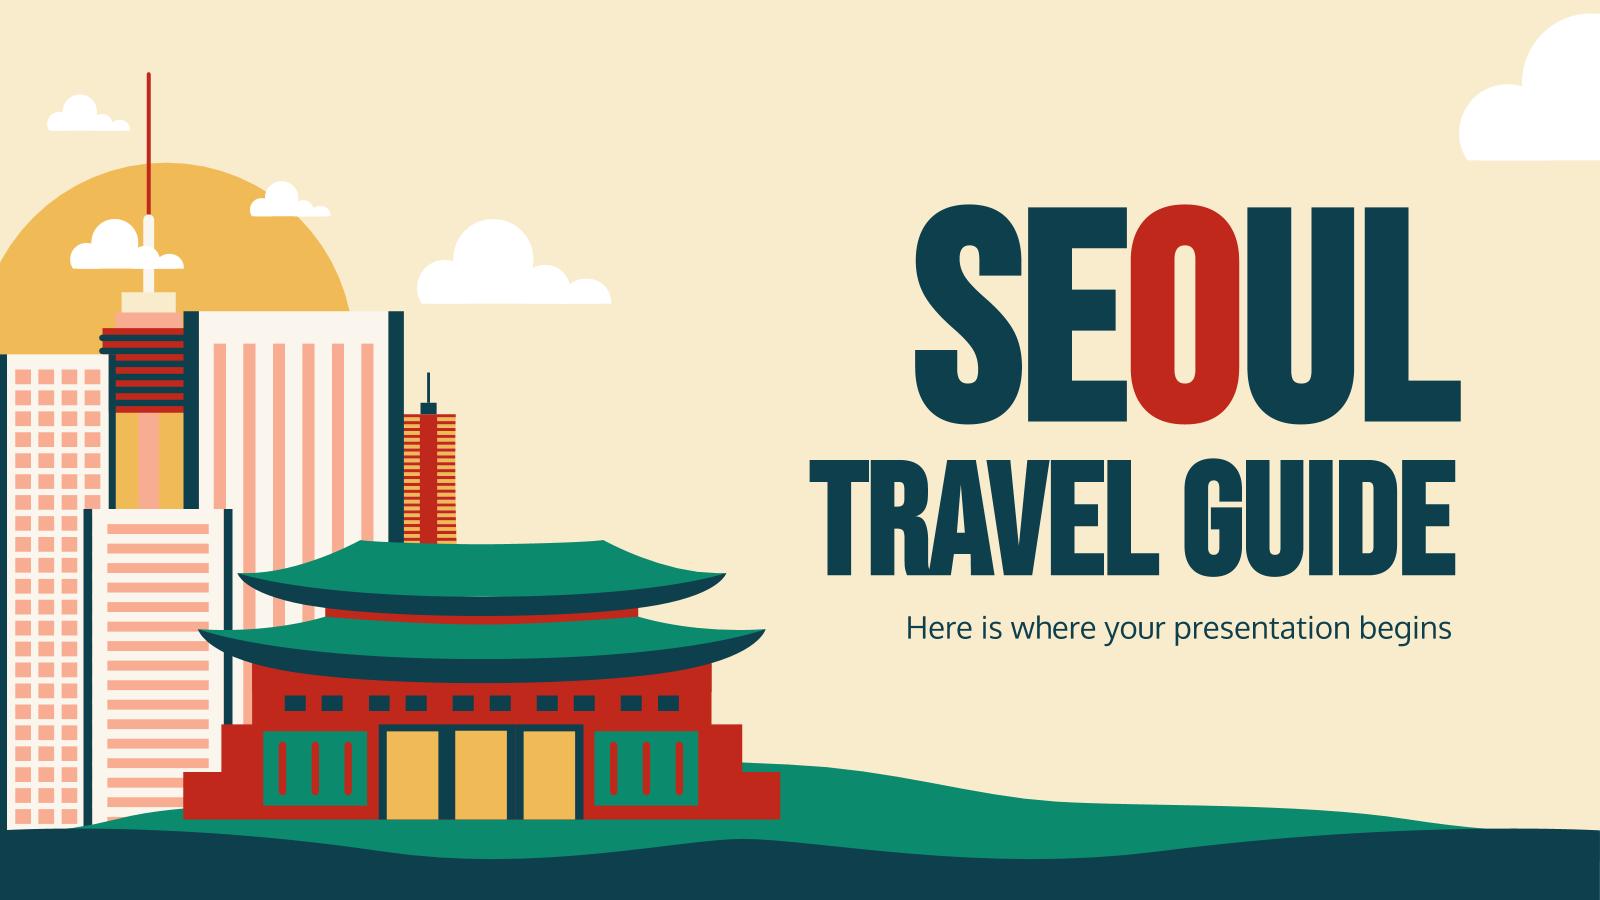 Travel Guide: Seoul presentation template